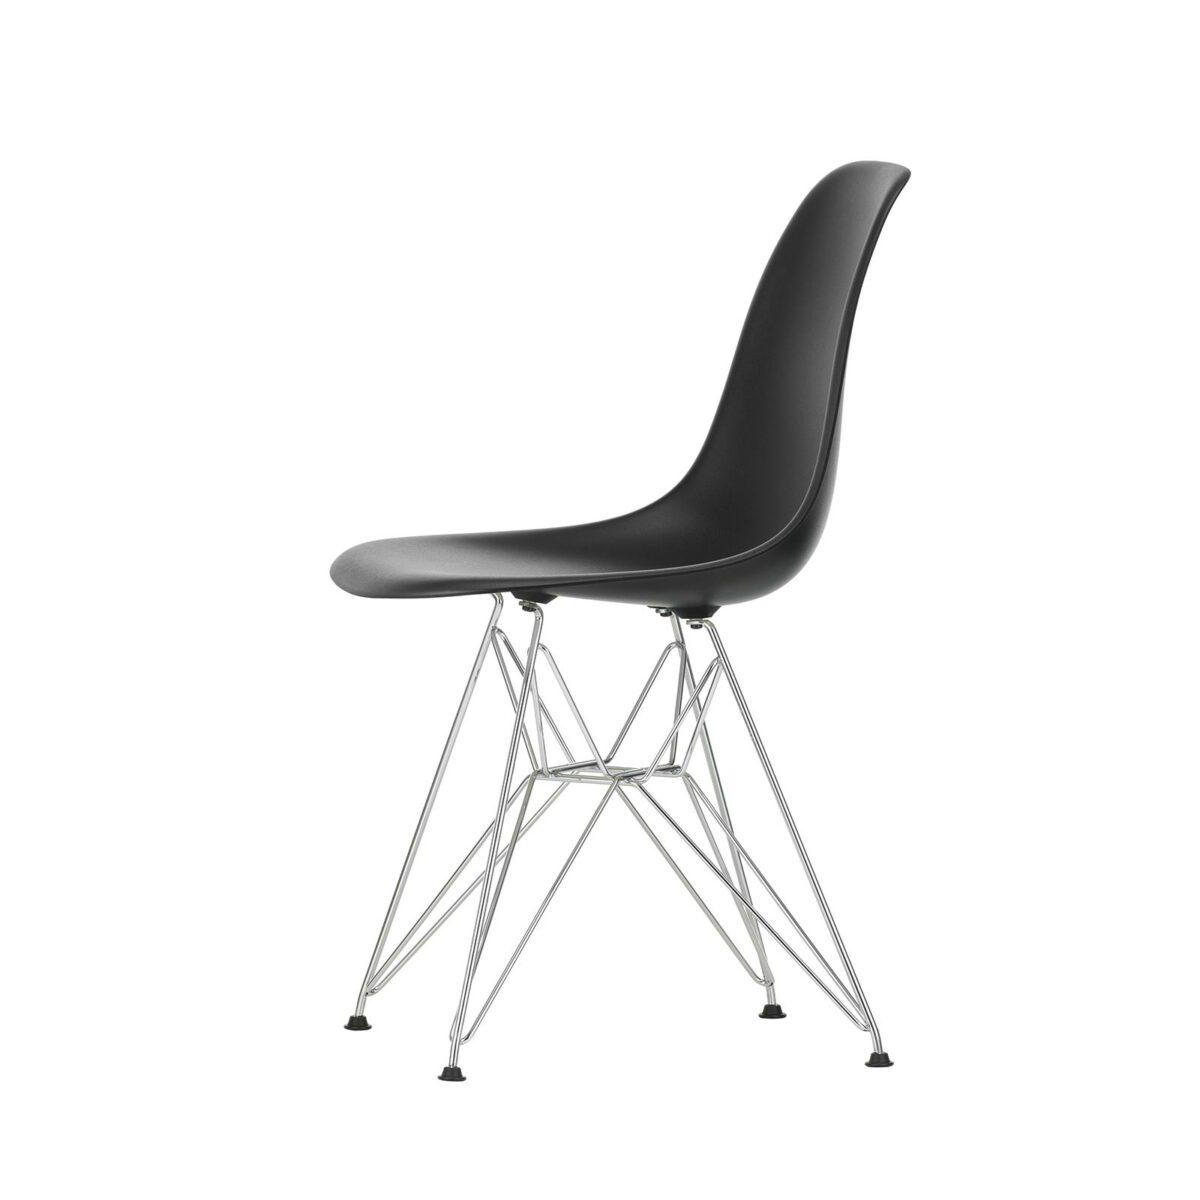 2779043 Eames Plastic Side Chair DSR 12 deep black 01 chrome left master